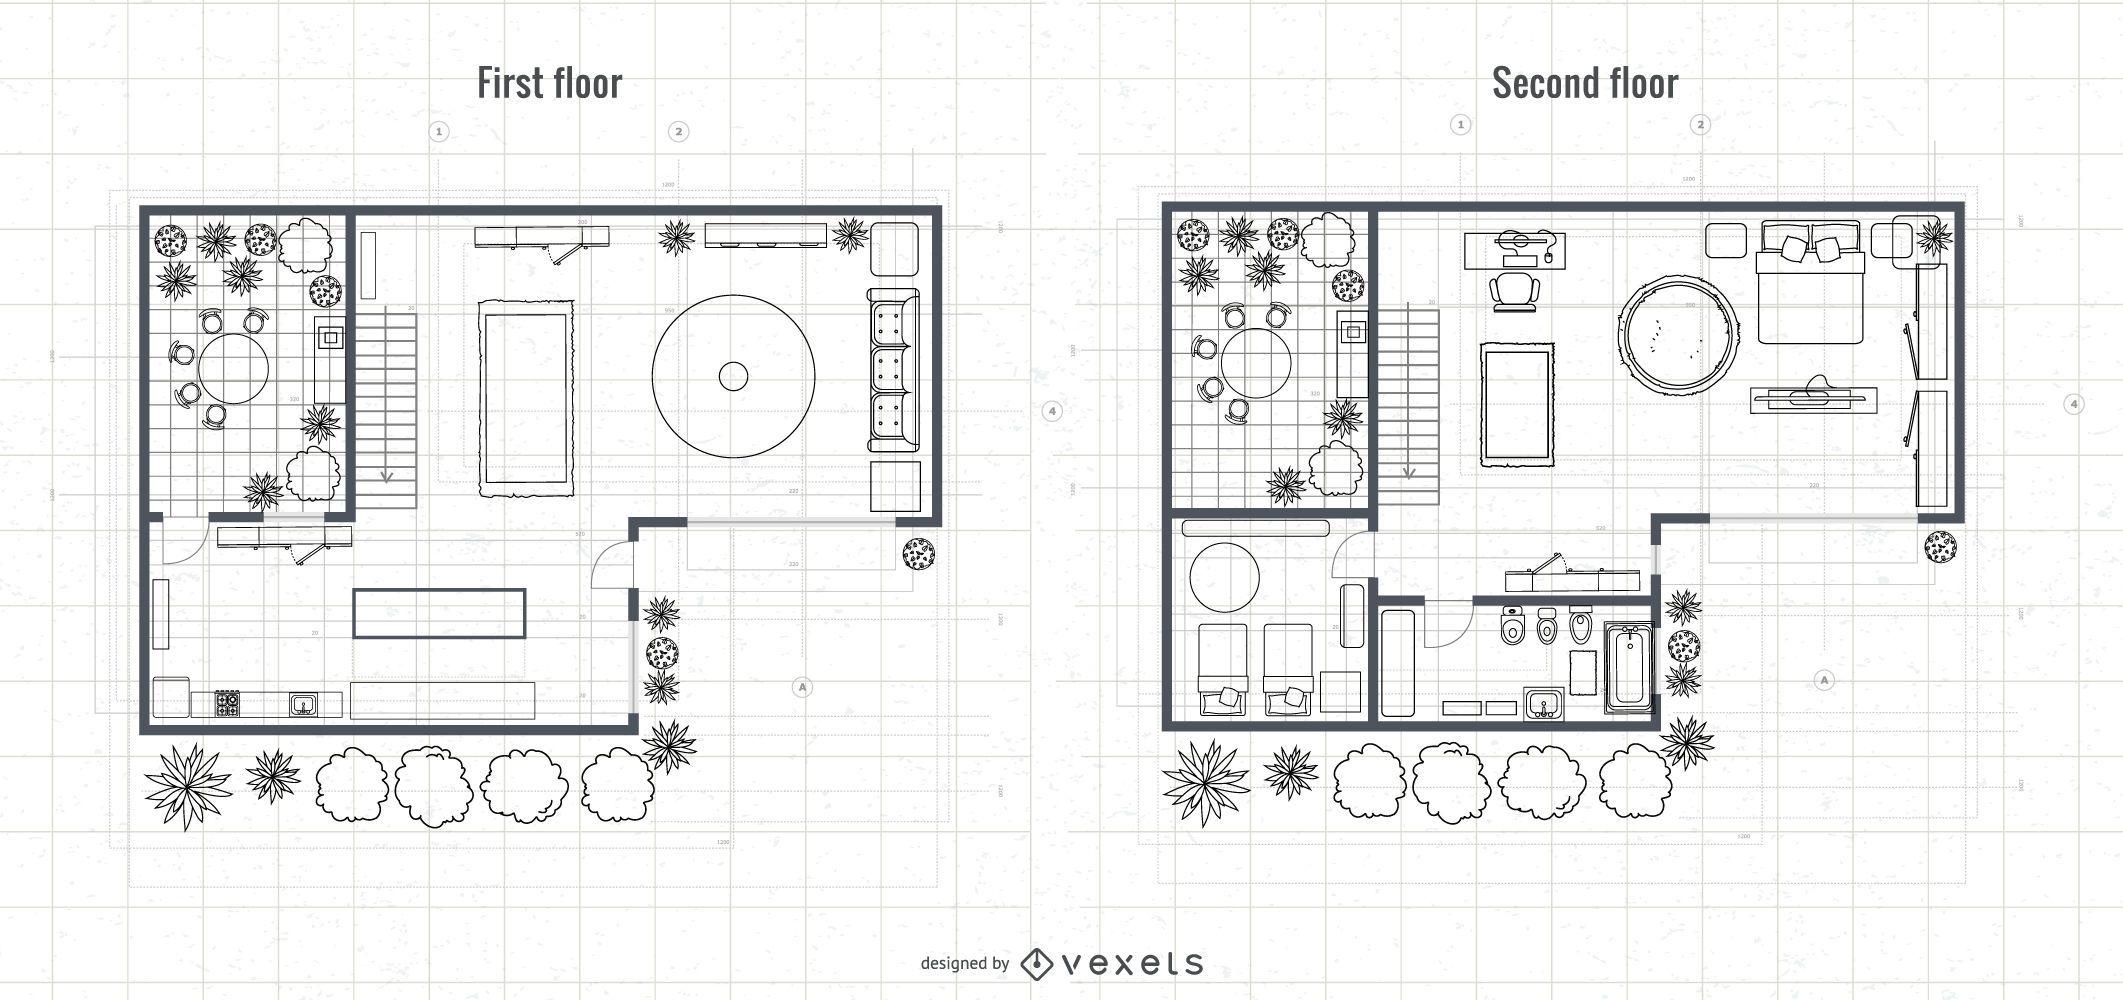 Arquitetura Projeto de planta de casa de 2 andares